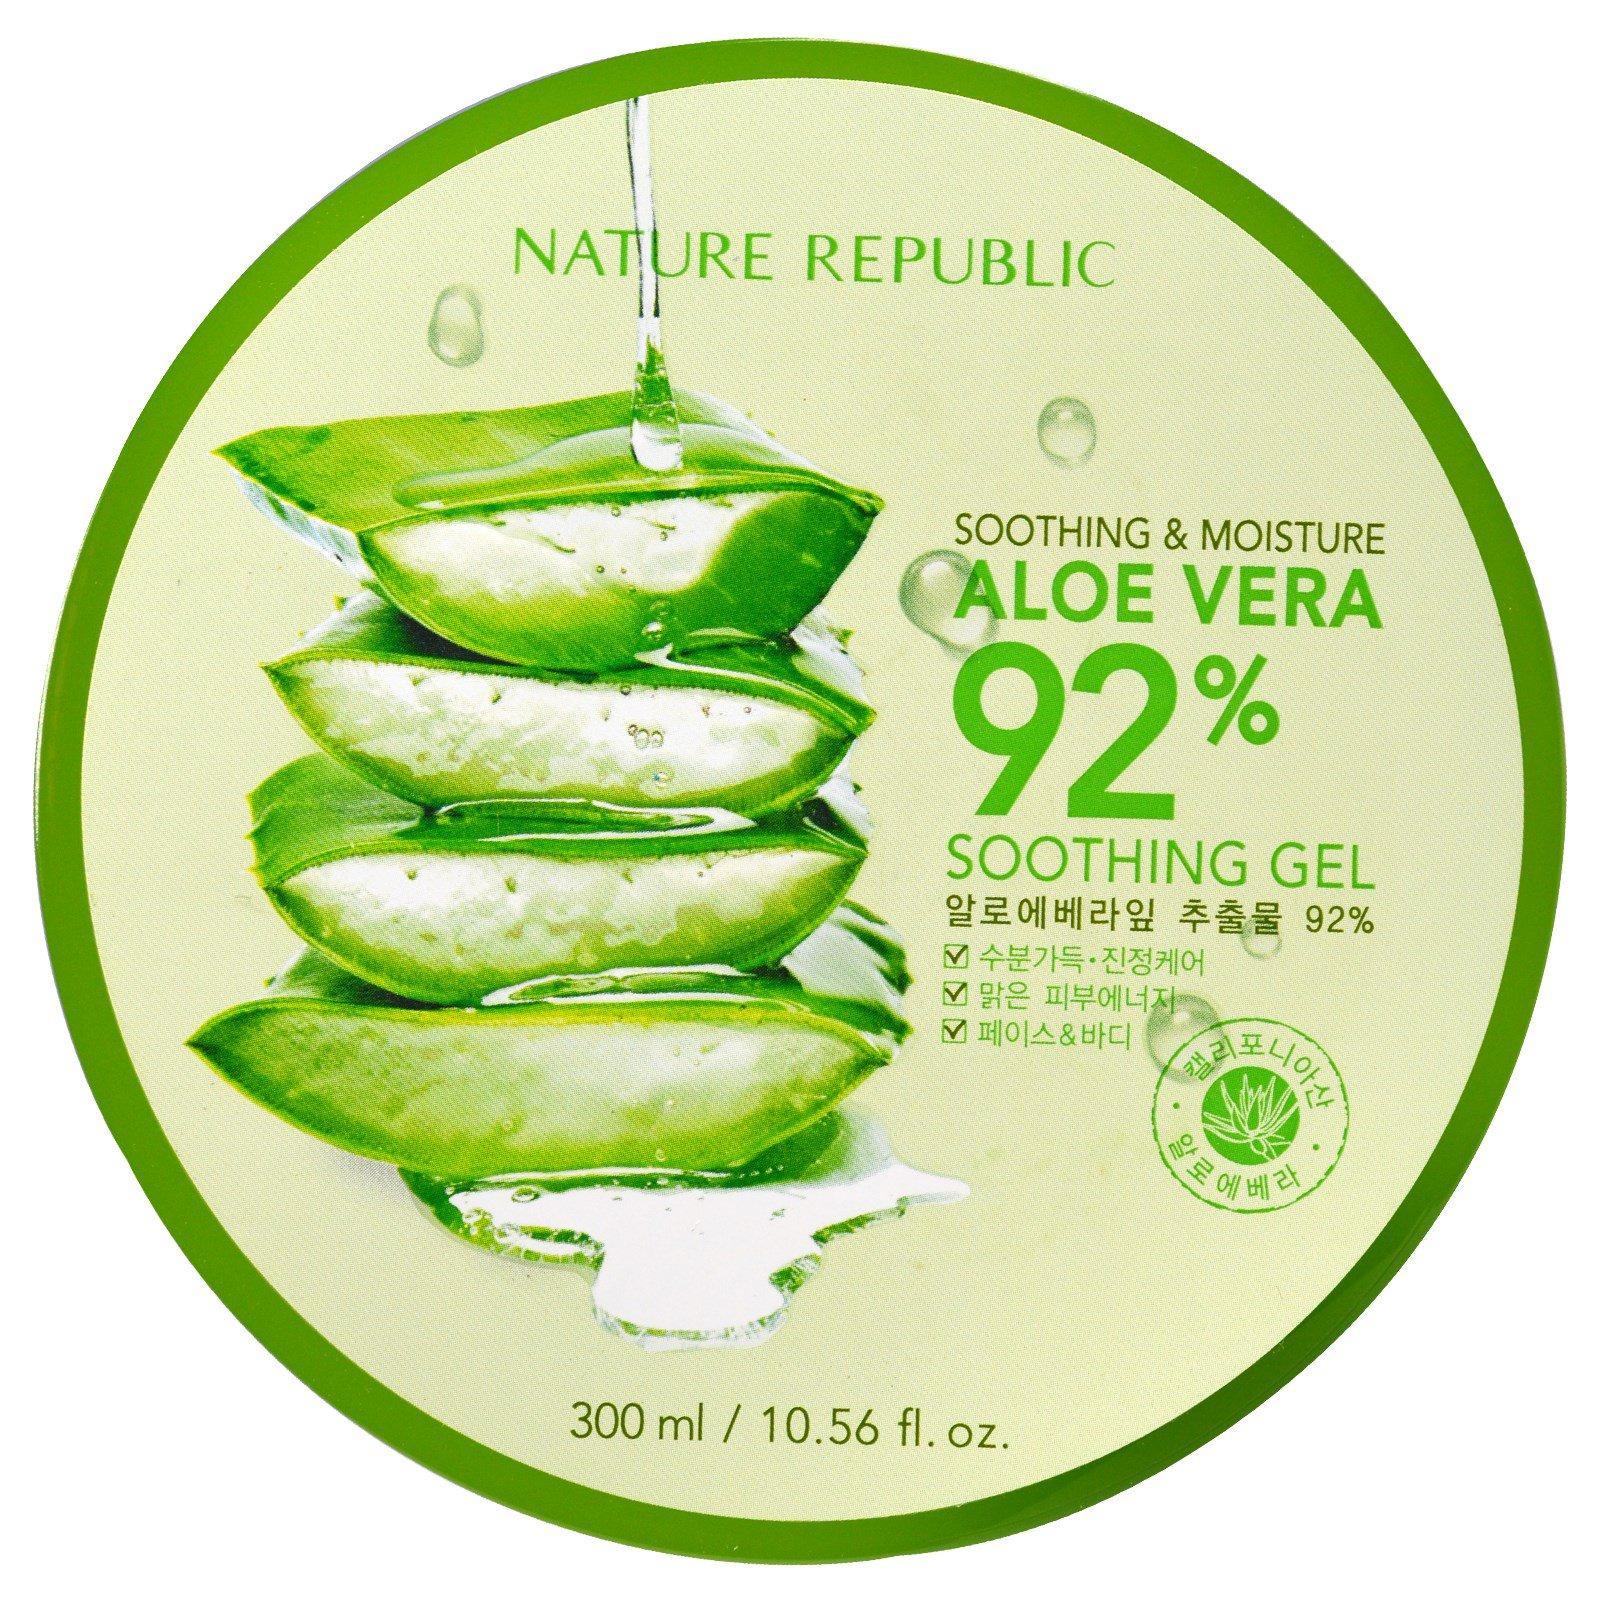 Nature Republic Soothing Moisture Aloe Vera 92